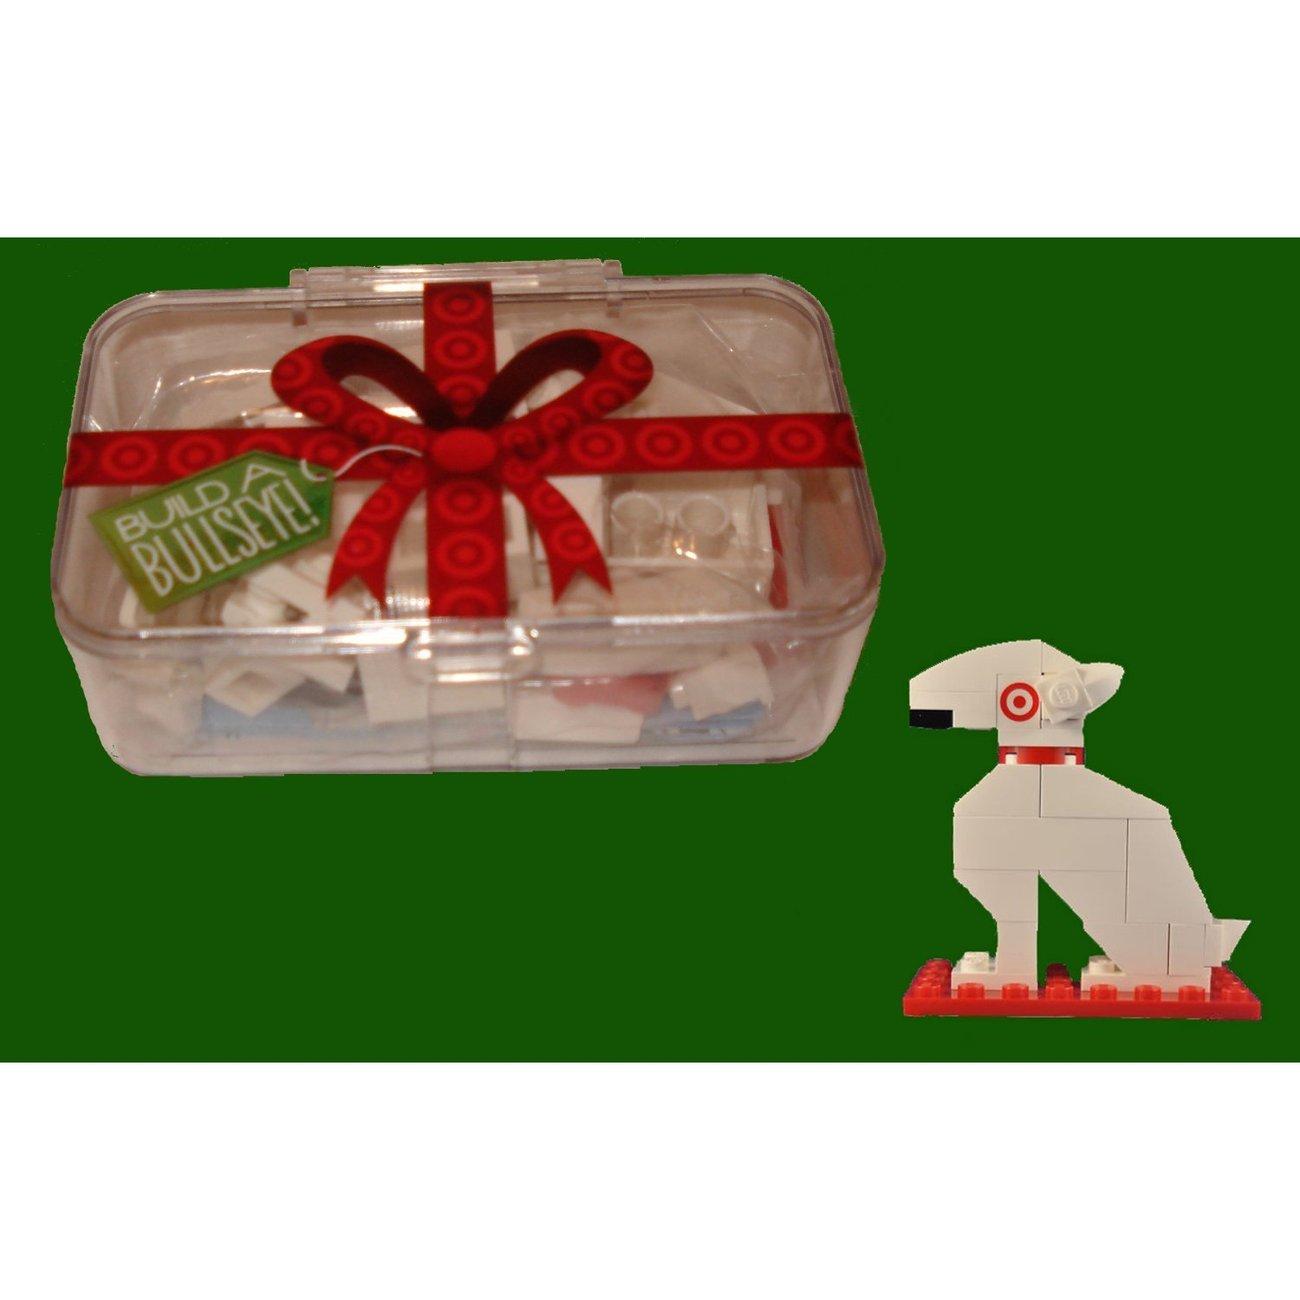 LEGO Target Build A Bullseye the white dog minifigure GiftCard Gift Card - New